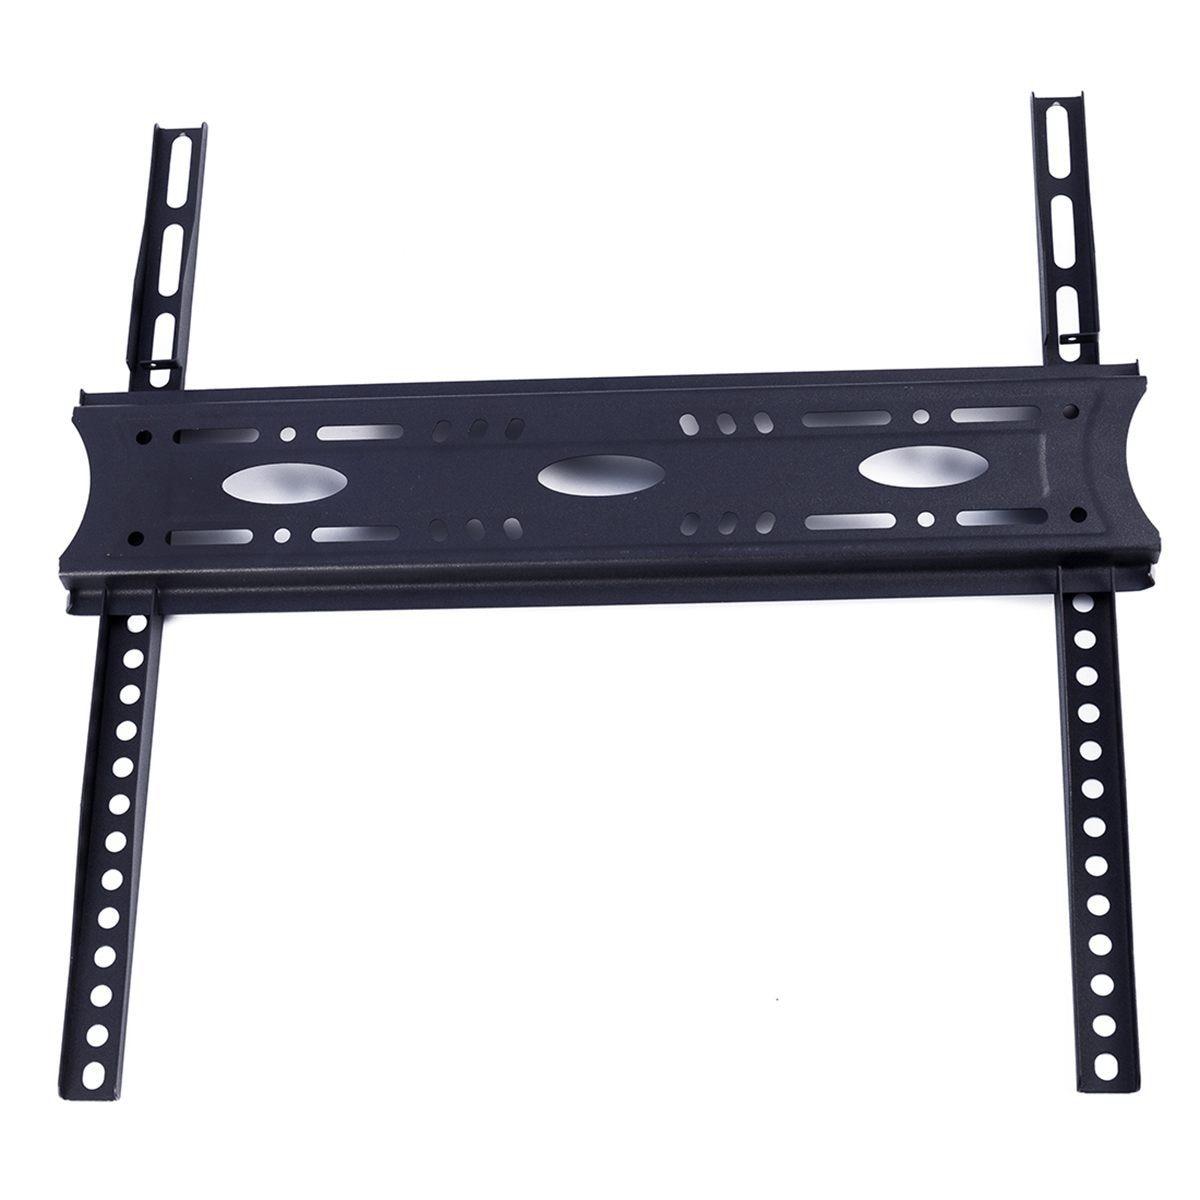 Home Improvement Bathroom Fixtures Cnim Hot Flat Slim Tv Wall Mount Bracket 23 28 30 32 40 42 48 50 55 Inch Led Lcd Plasma